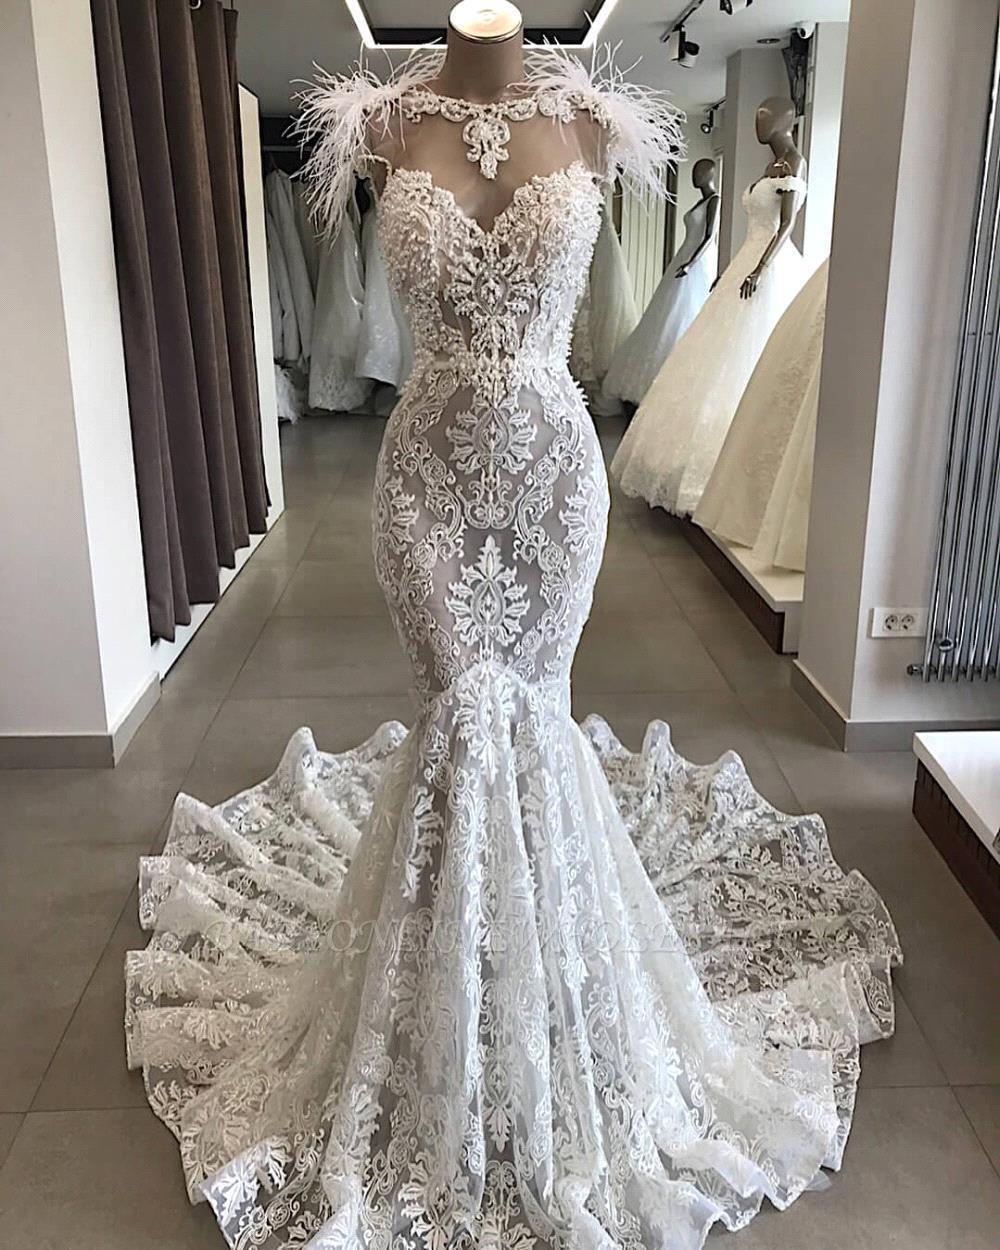 Luxus White Hollow Sweetheart Open Back Lace Langes Brautkleid mit Pelzausschnitt